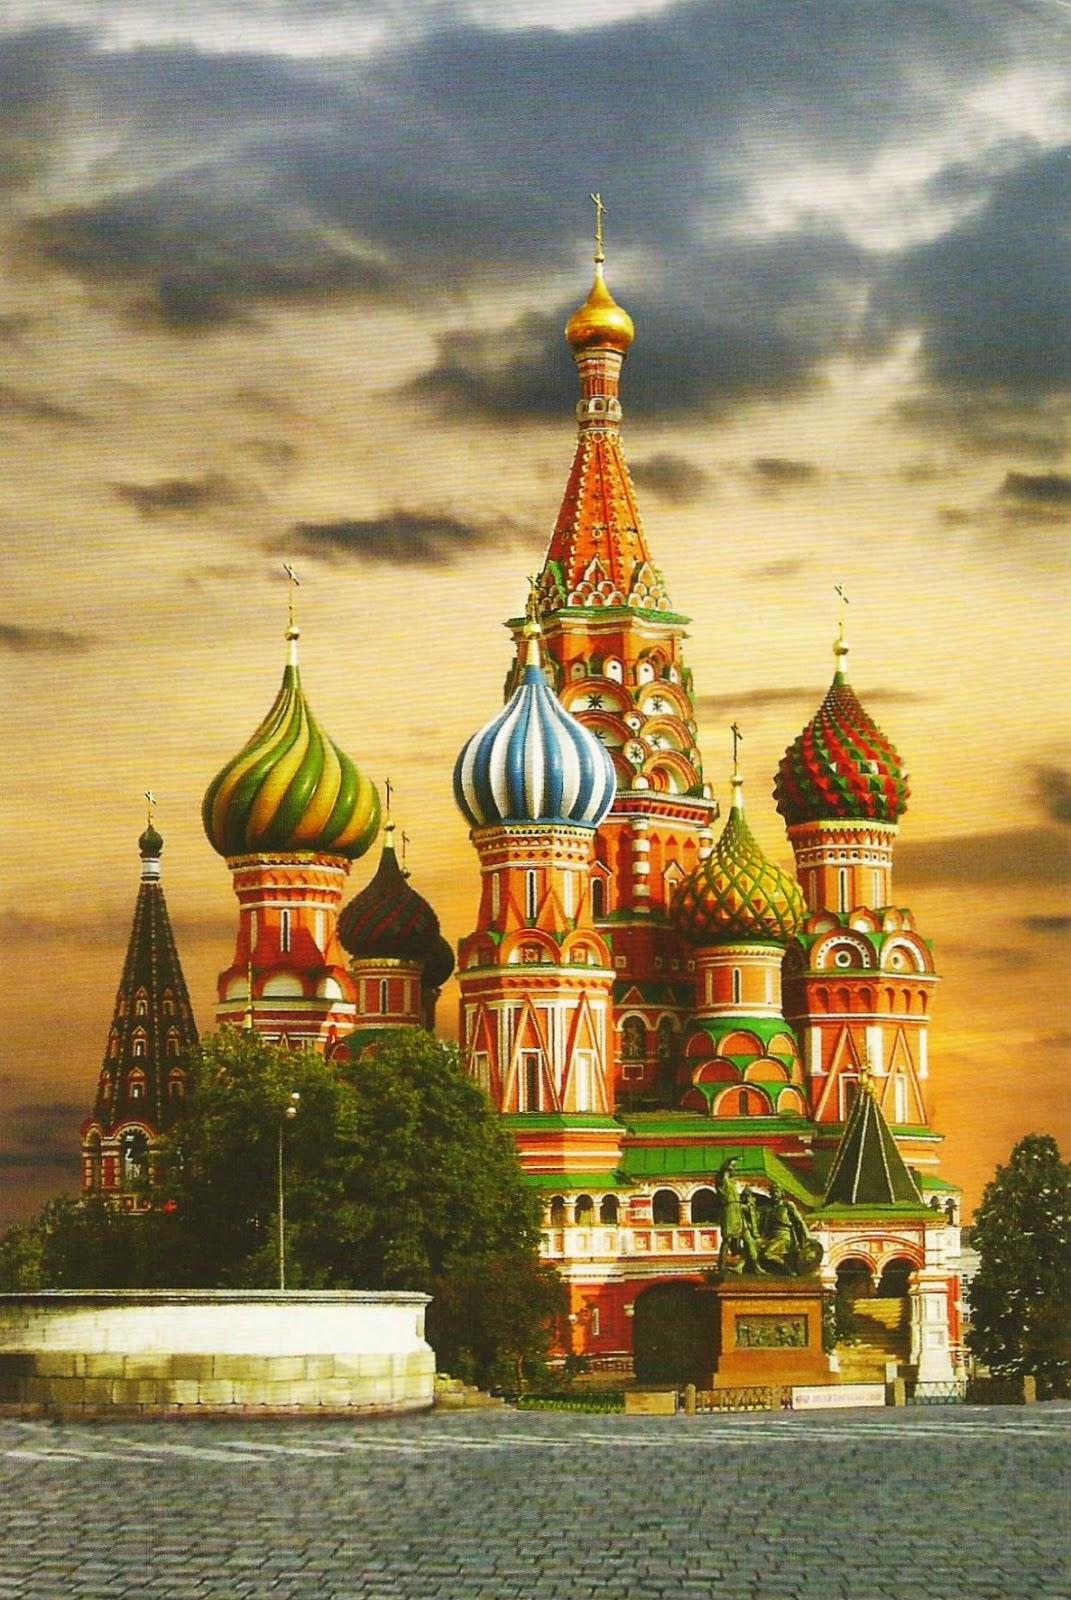 russian kremlin moscow 1600 - photo #17